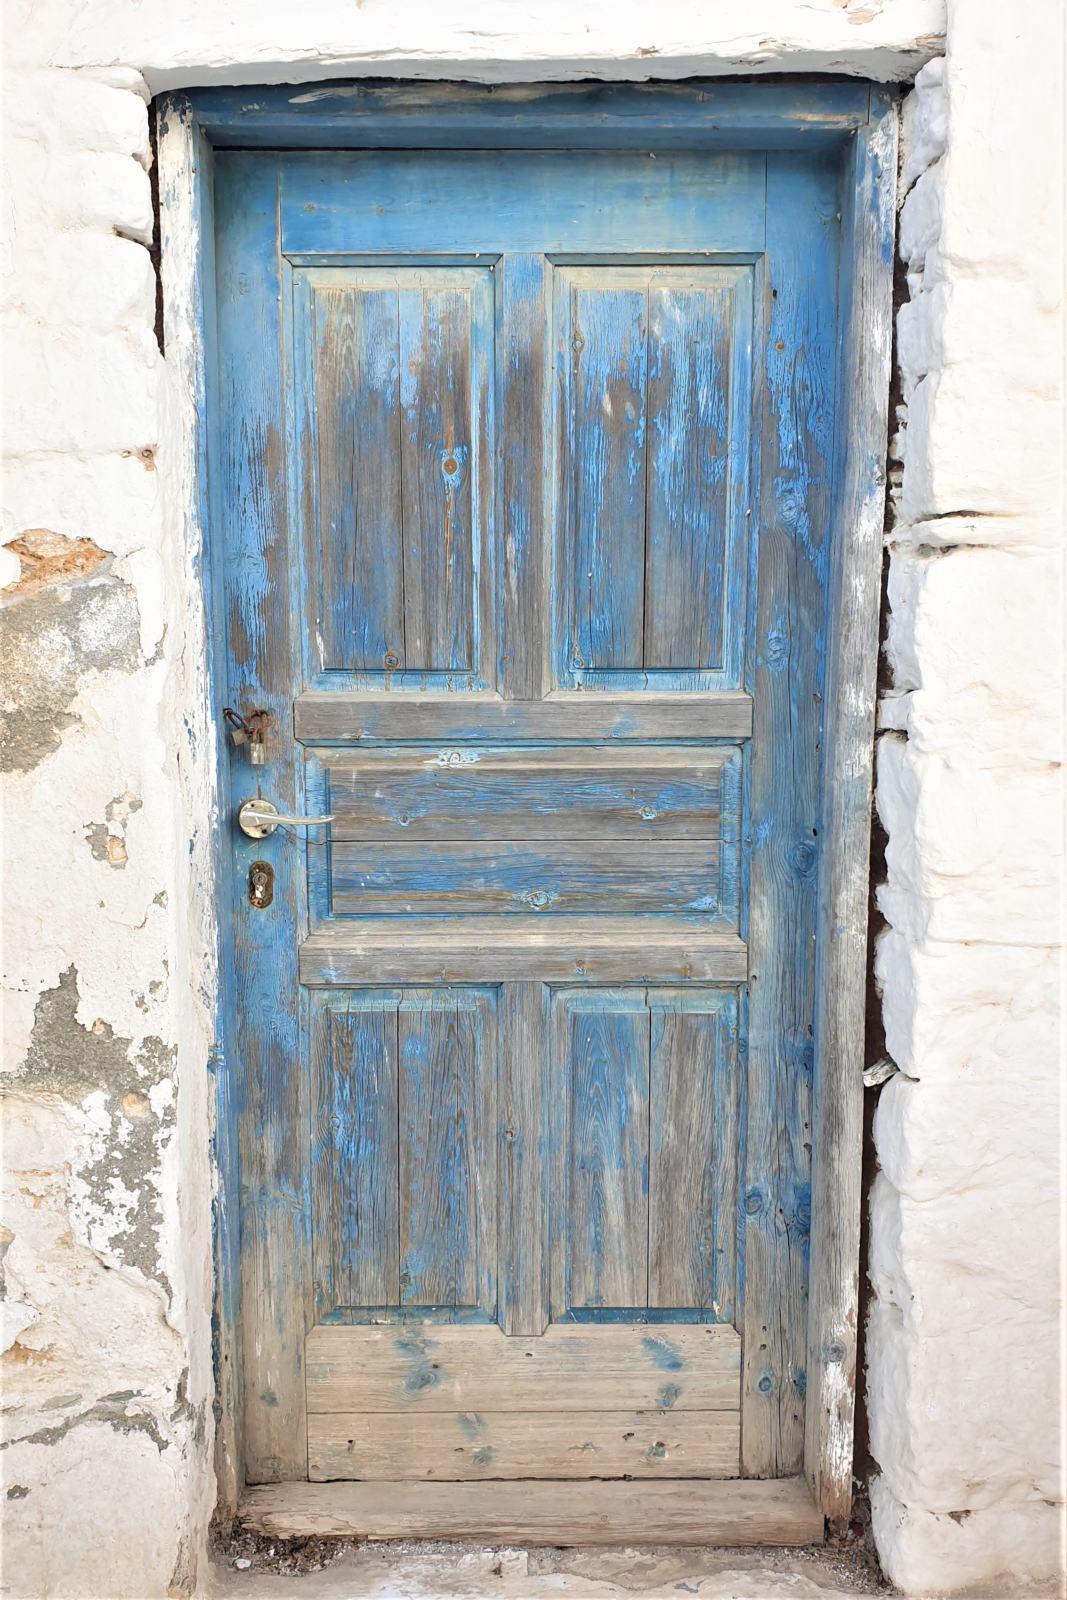 Porte d'ingresso delle case del Kastro - Isola di Folegandros